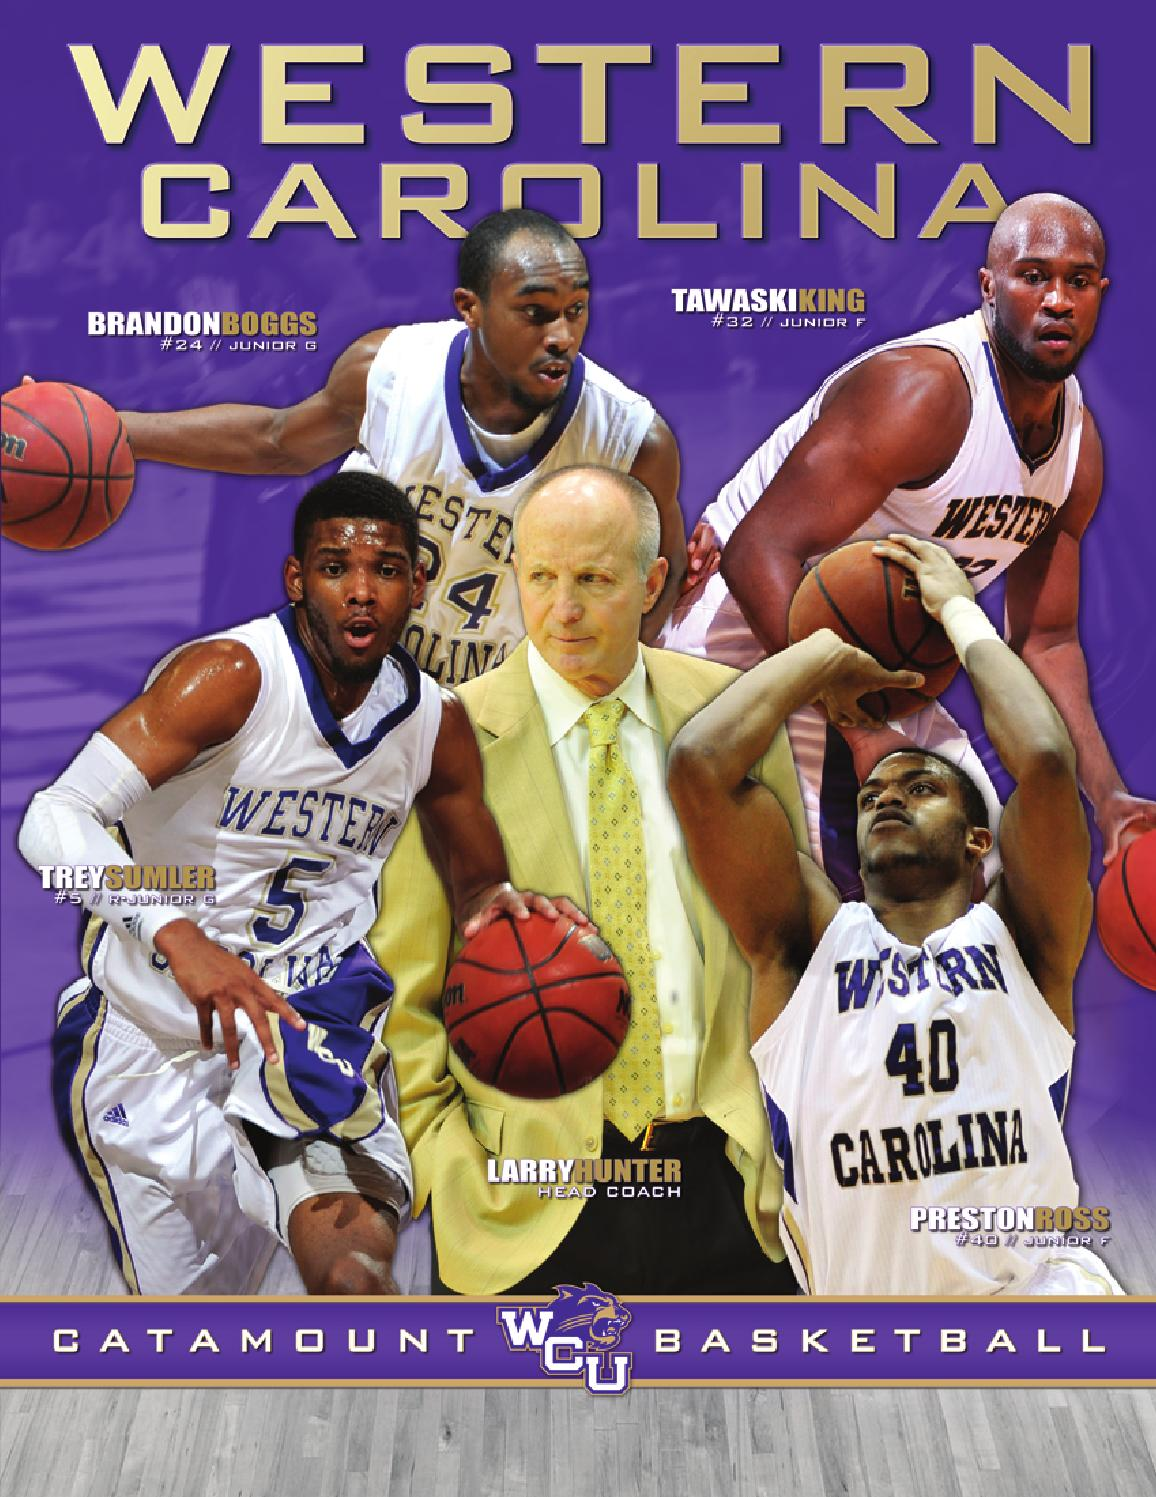 2012-13 Men s Basketball Yearbook by Western Carolina University Athletics  - issuu c889a7496